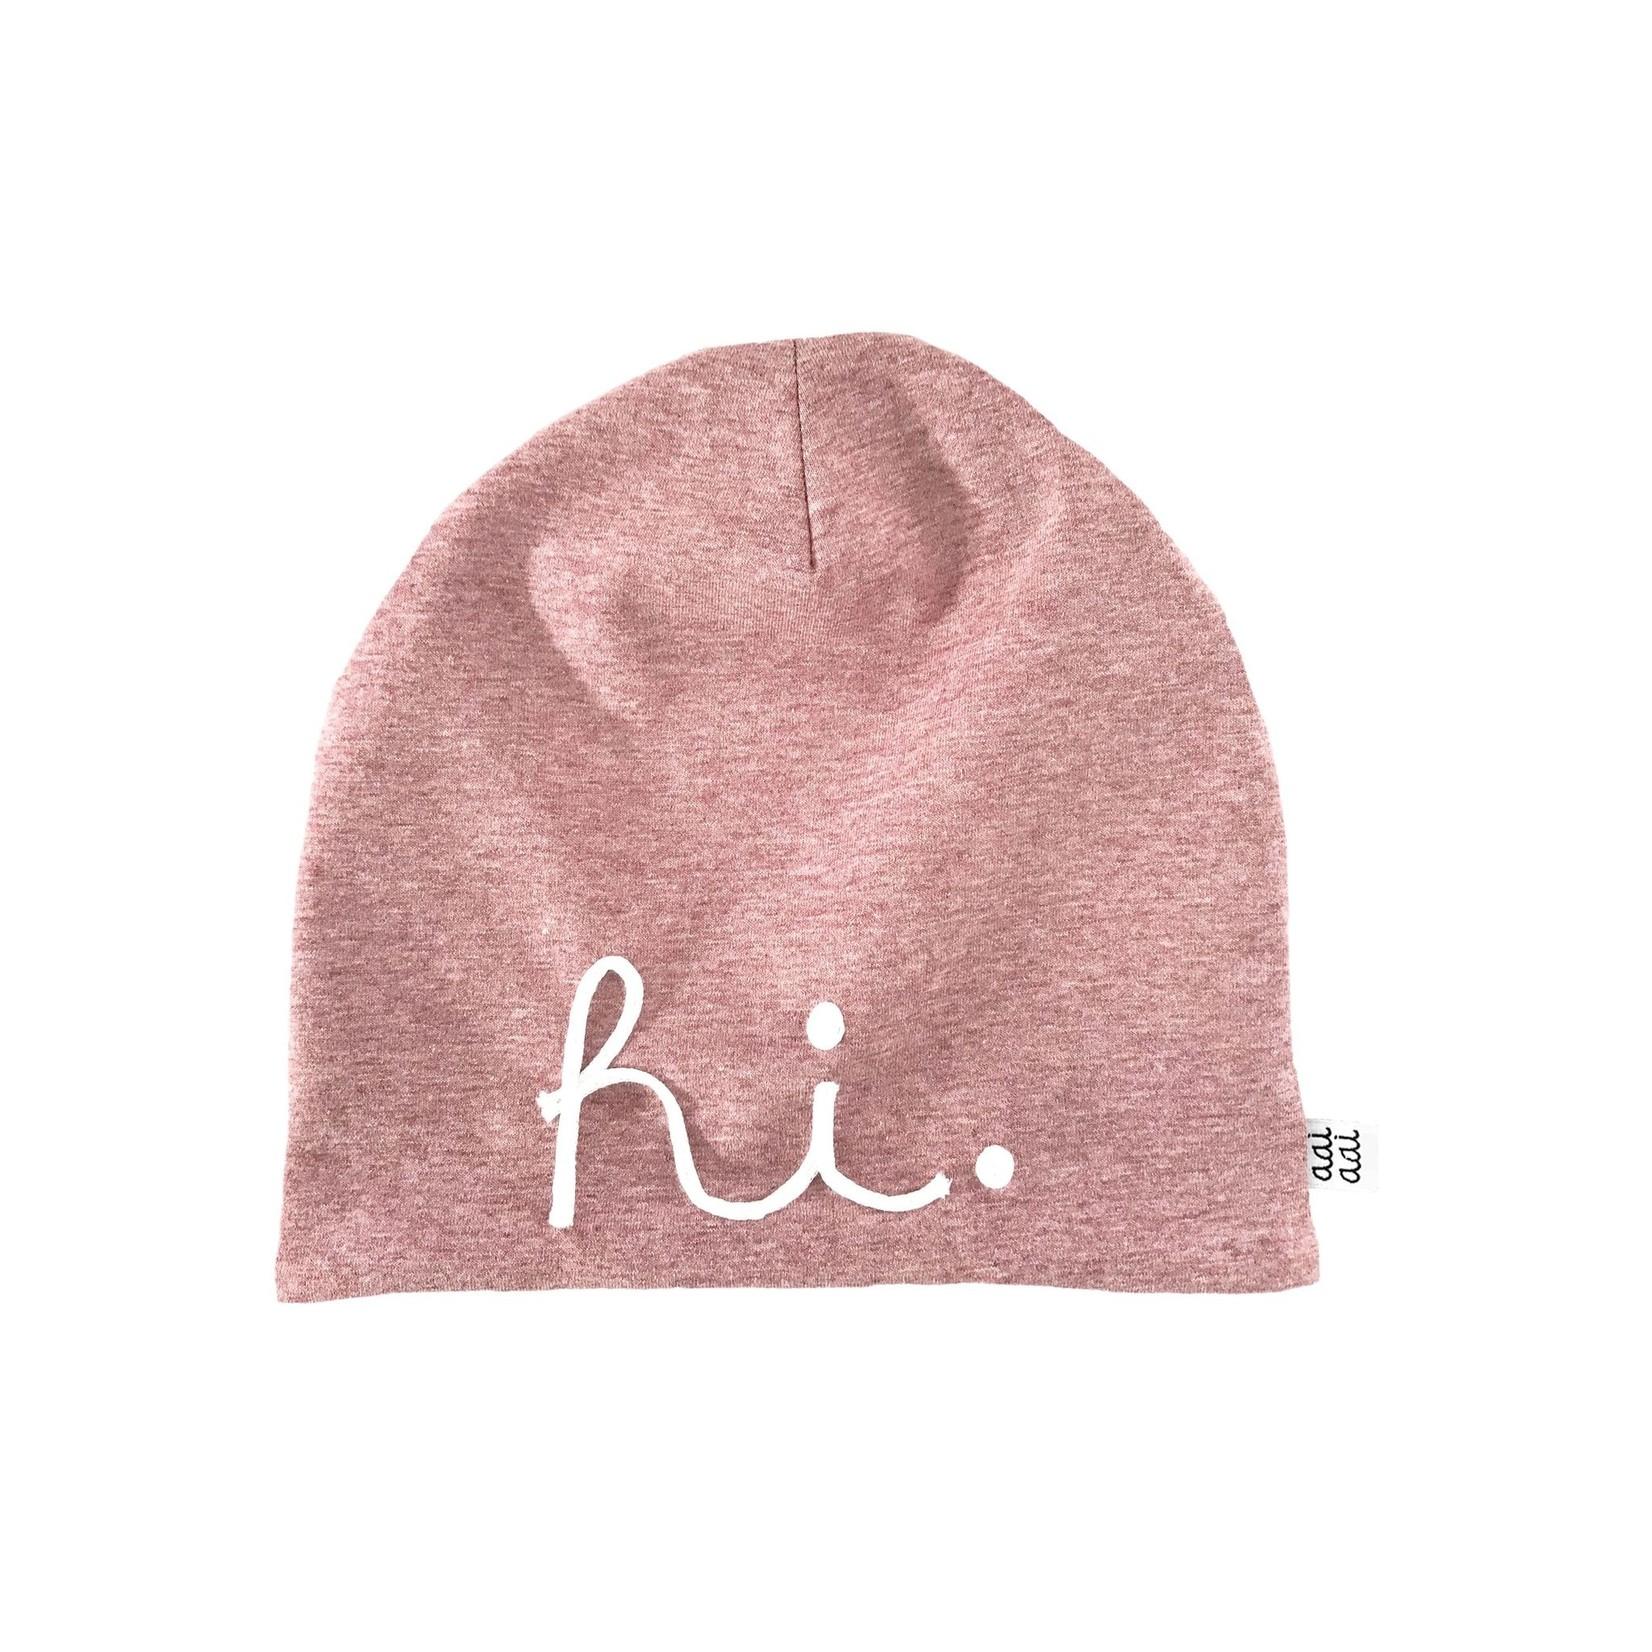 AAI AAI Muts HI (Roze)